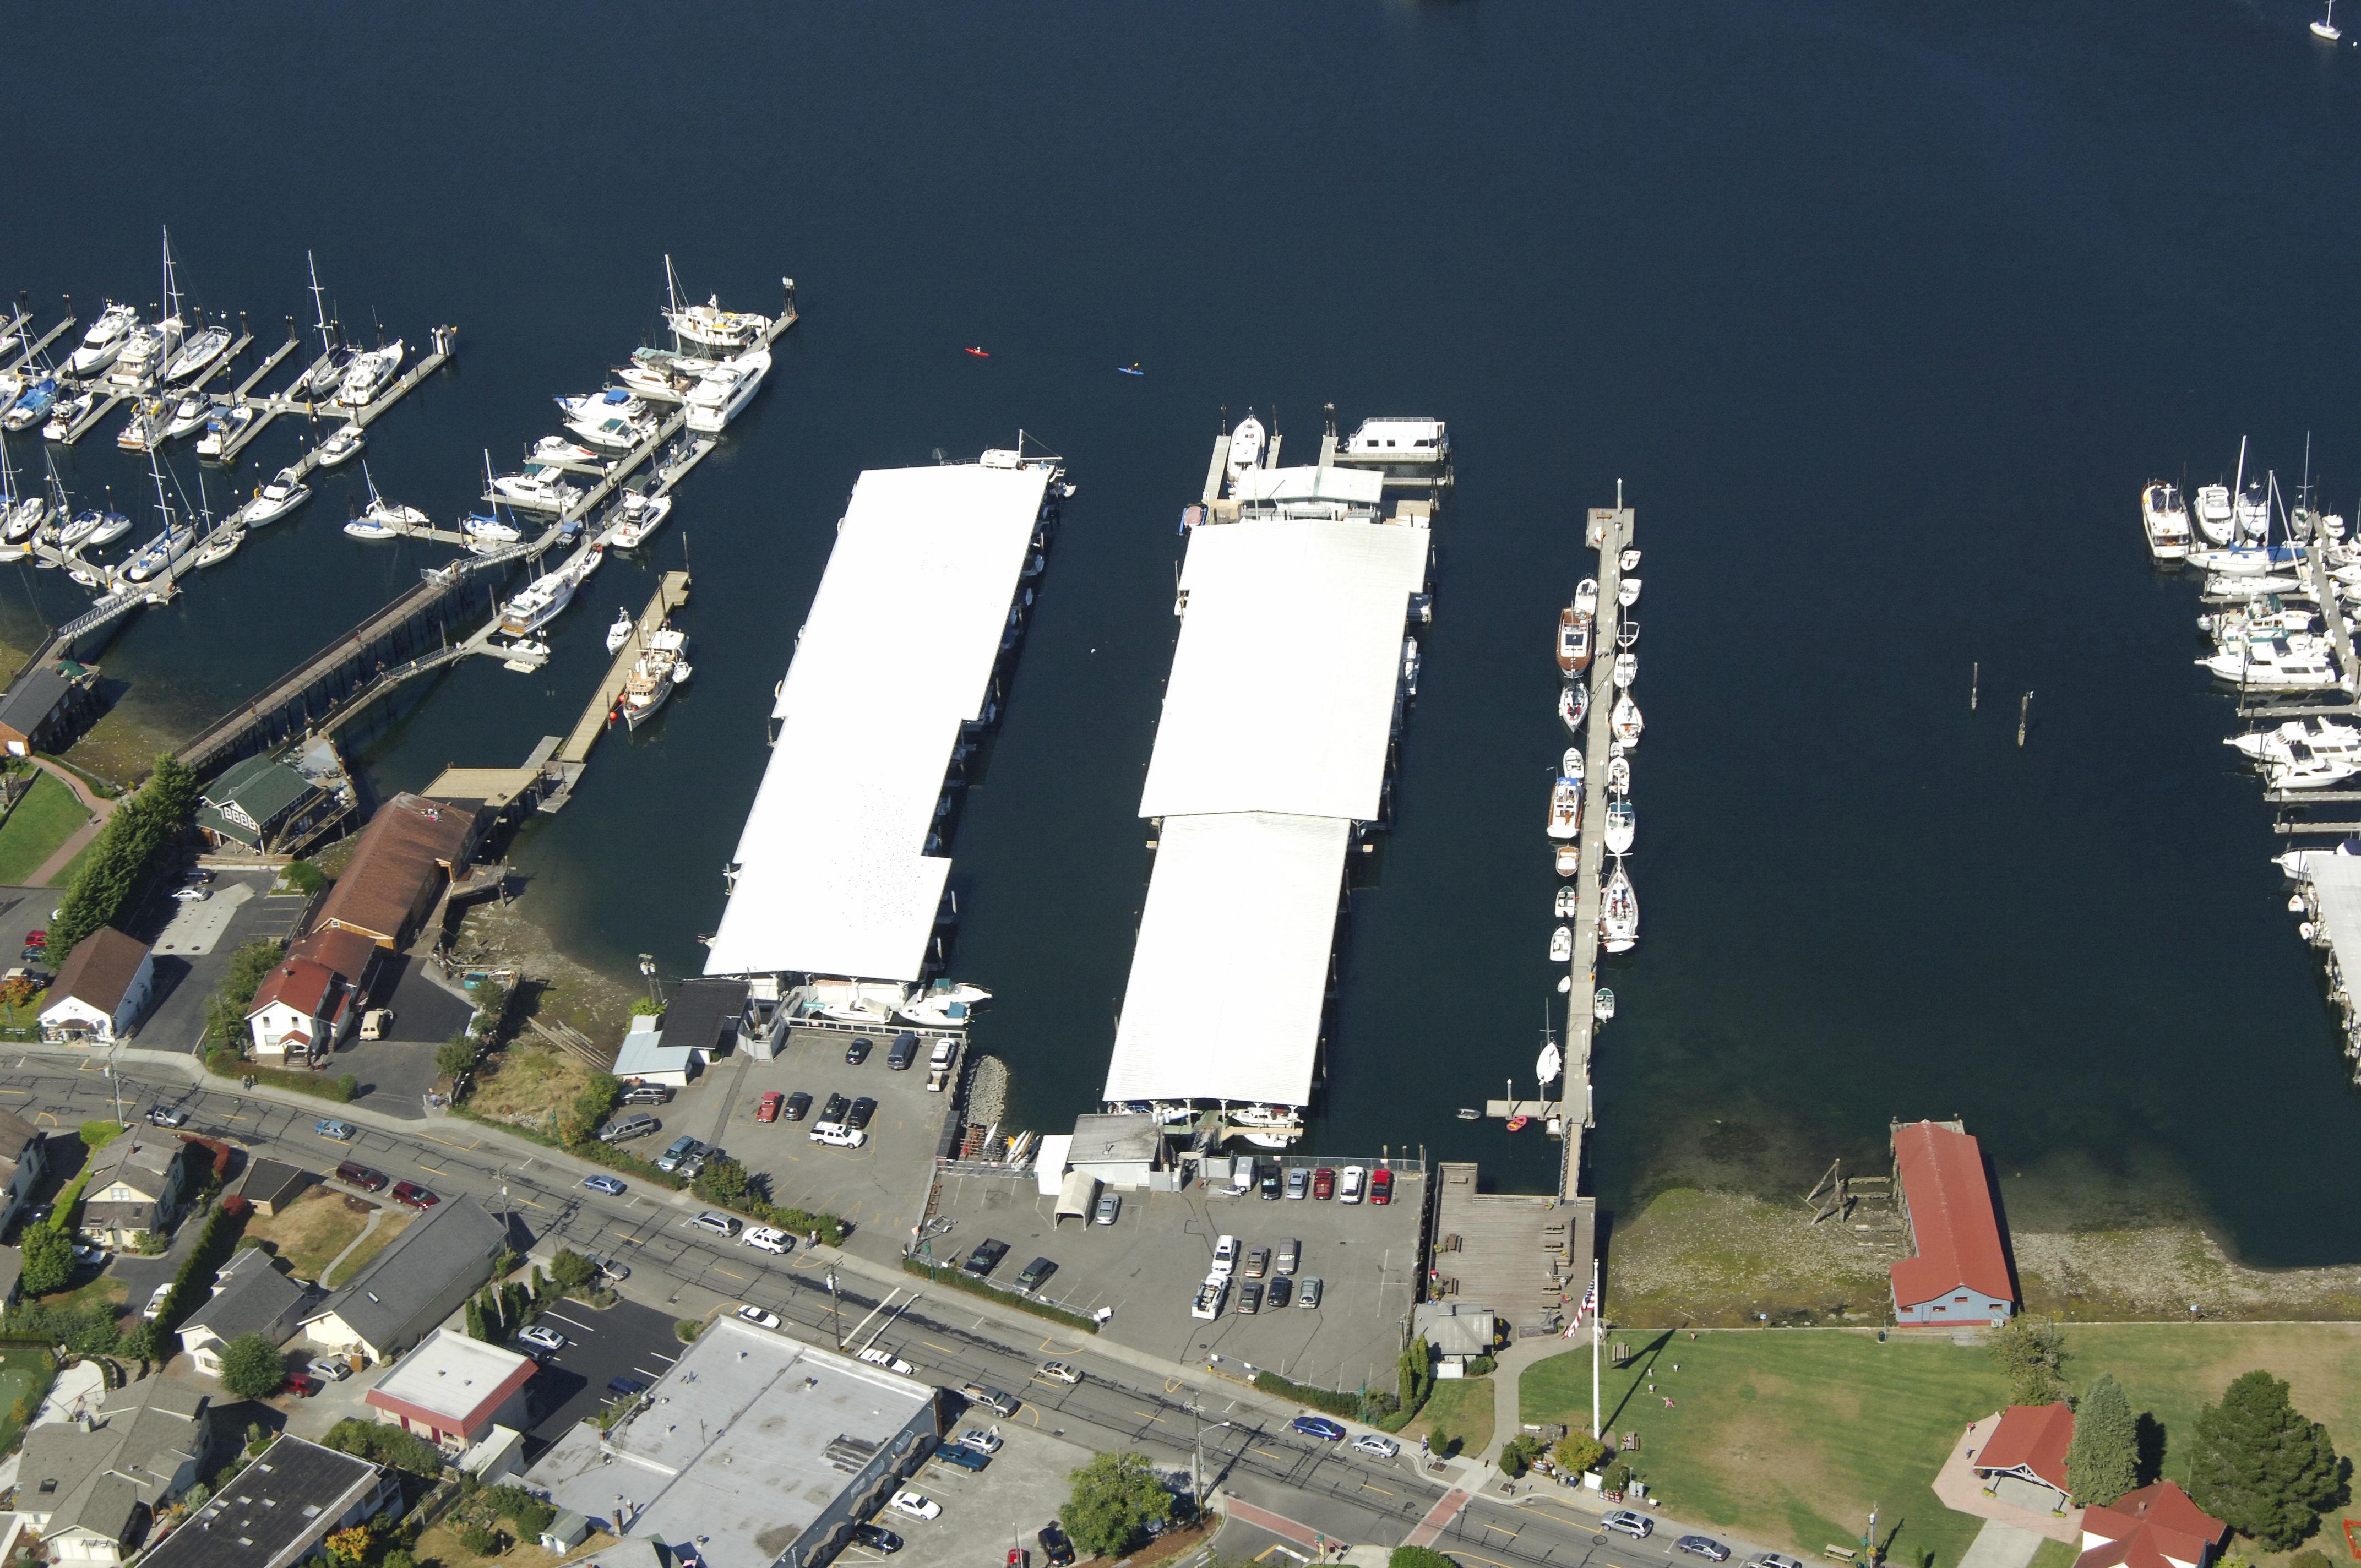 Harborview Marina in Gig Harbor, WA, United States - Marina Reviews - Phone Number - Marinas.com